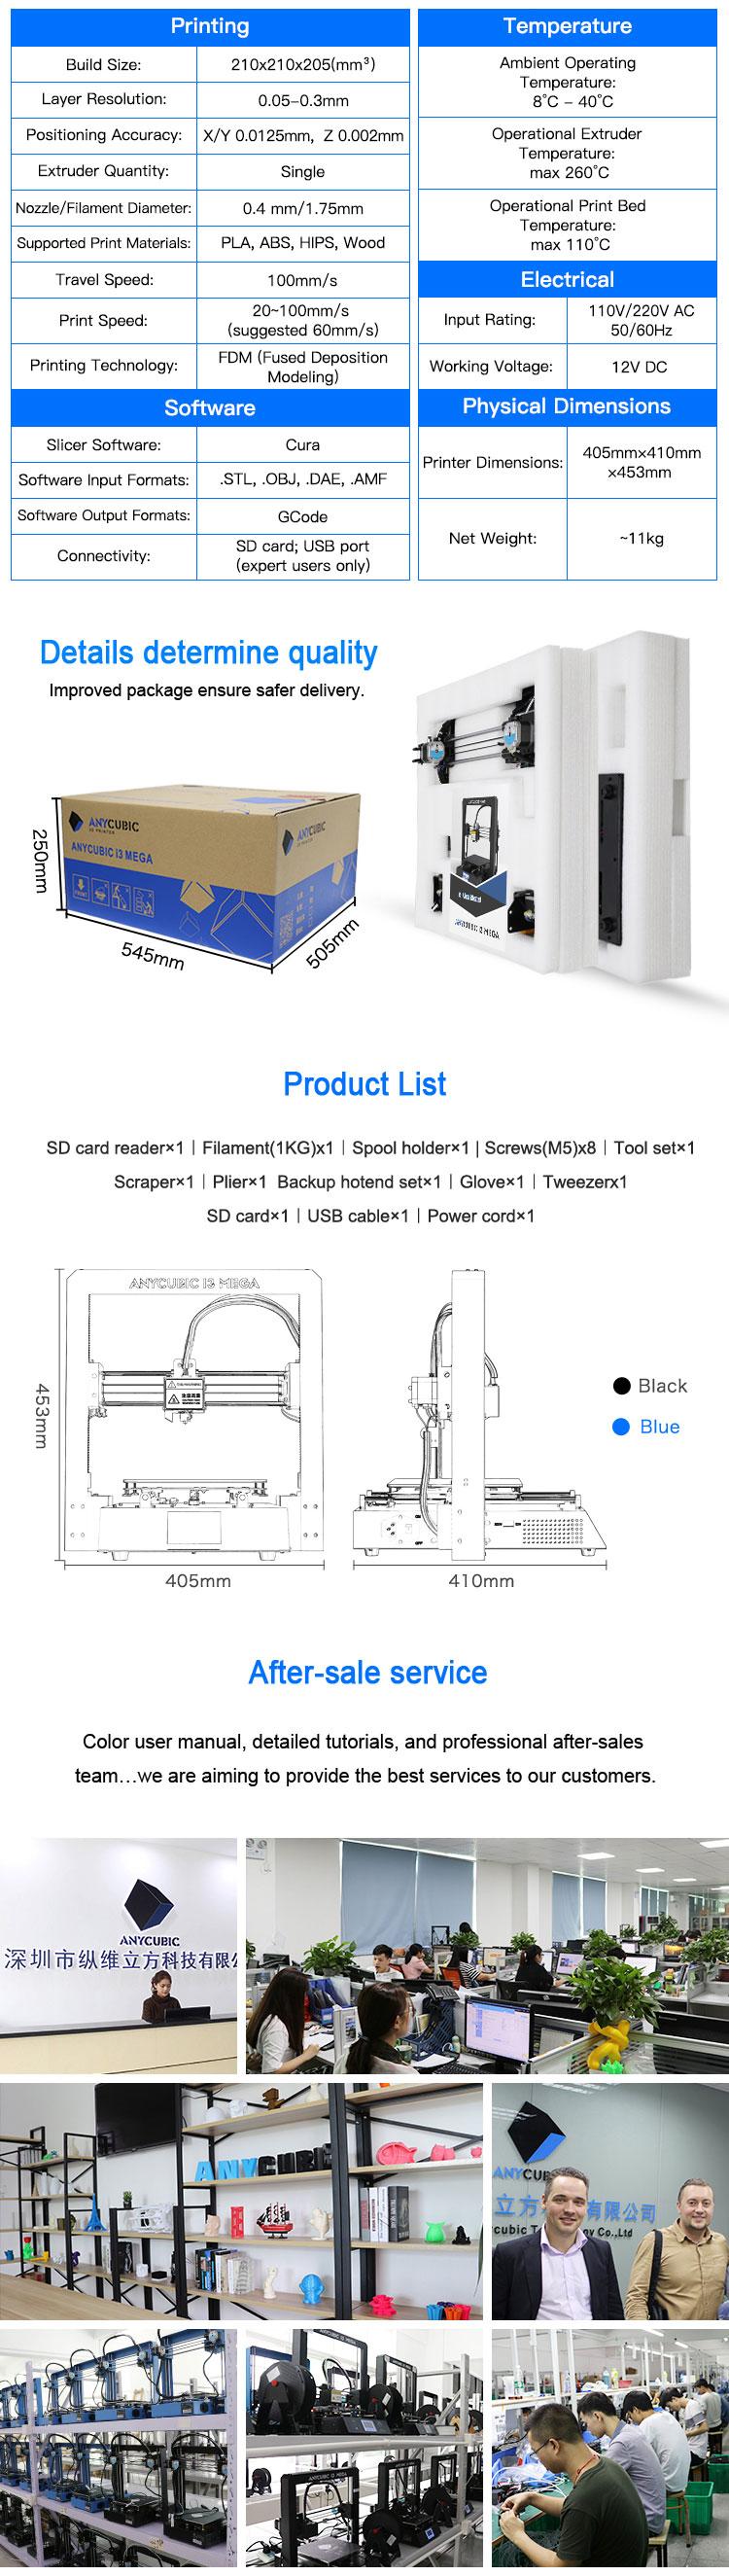 Anycubic 3D printer impresora 3d I3 Mega full metal imprimante 3d High Precision Patented Lattice Platform 3d printer kit (1)